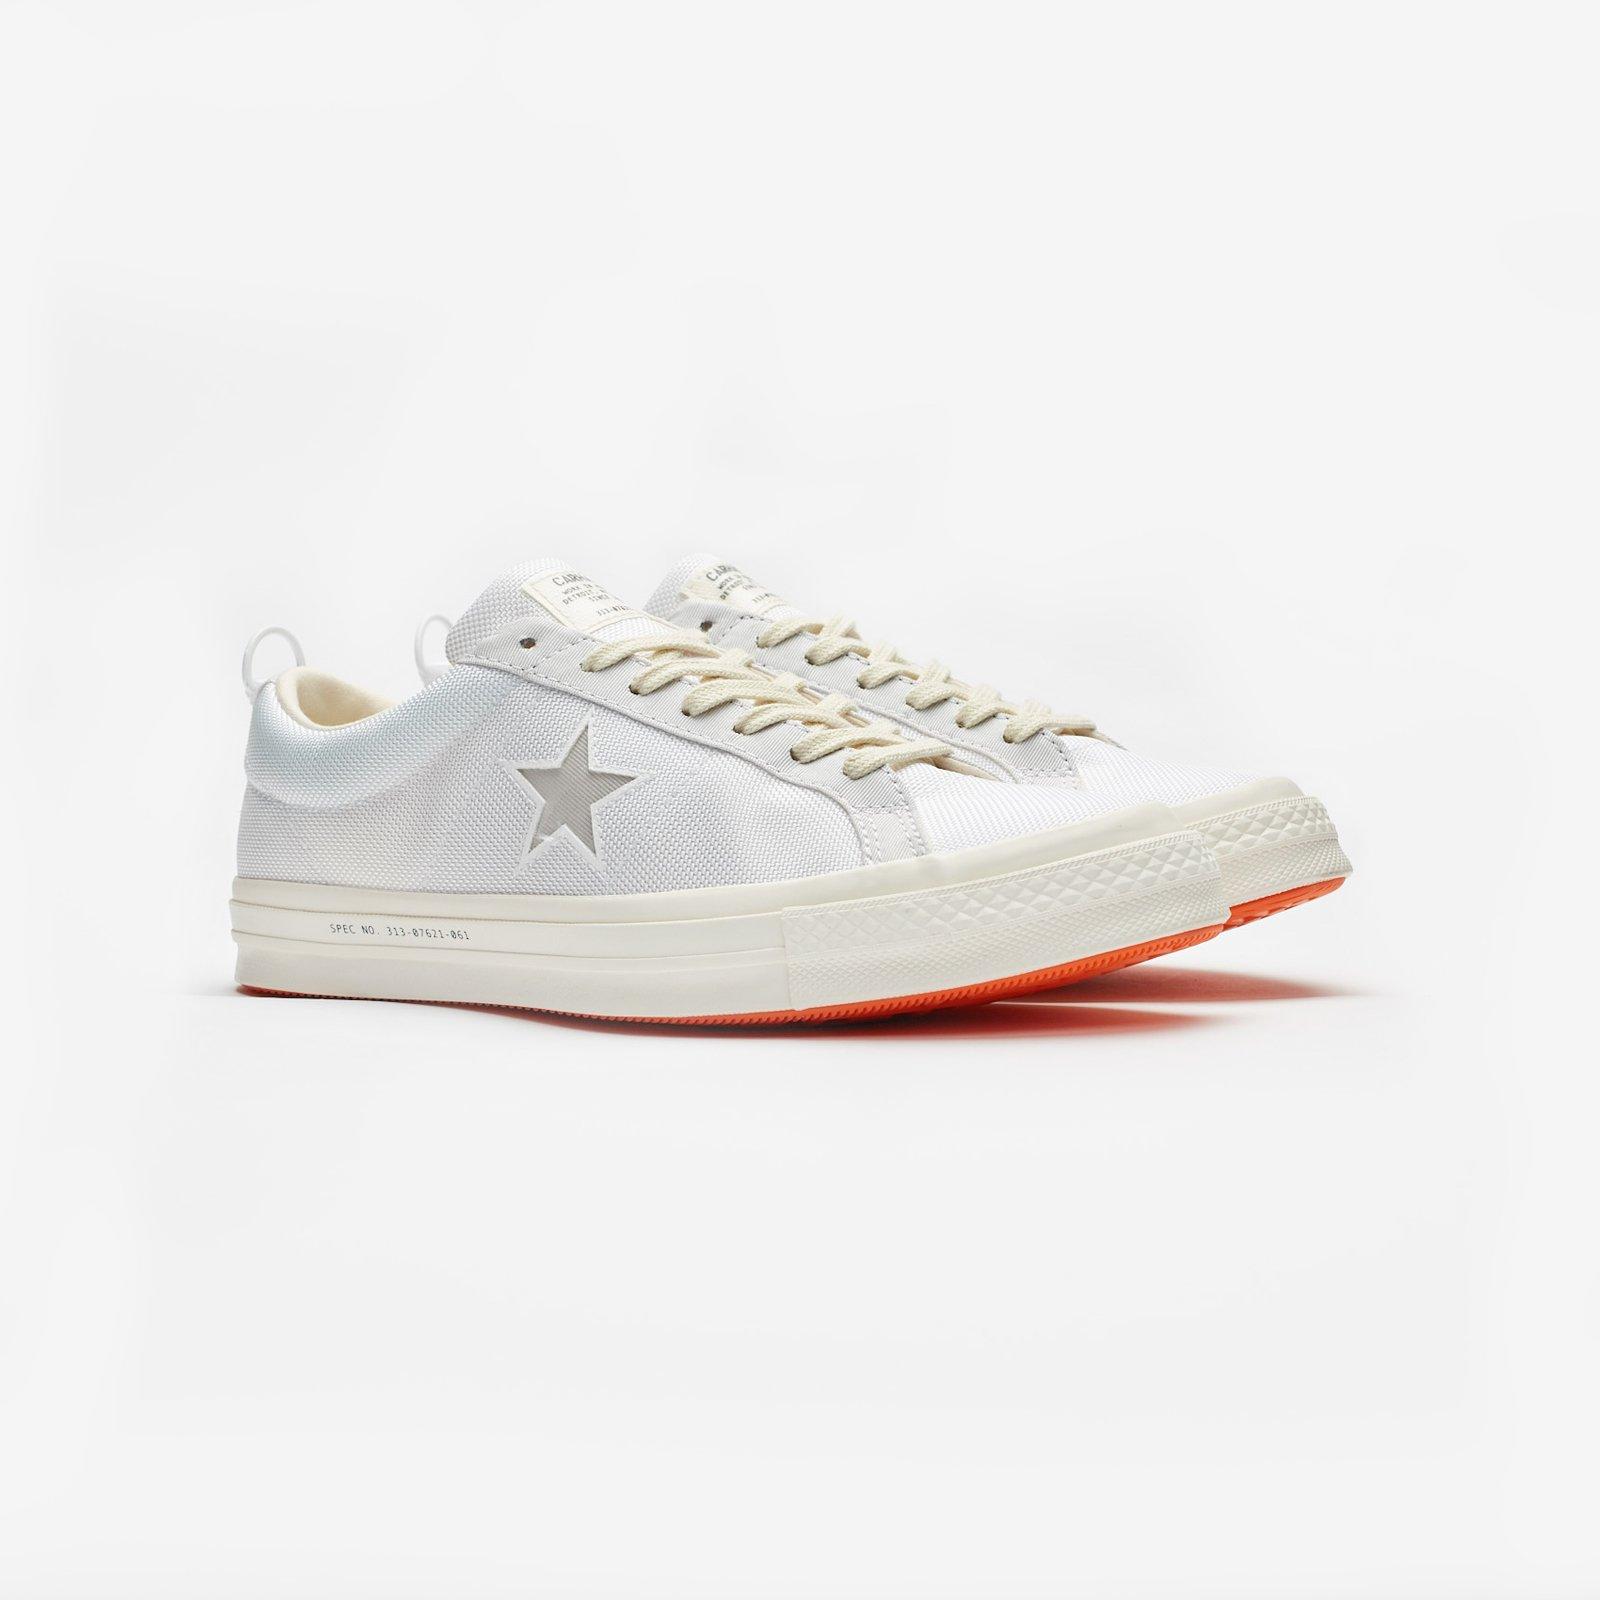 4608487045eff Converse One Star x Carhartt WIP - 162821c - Sneakersnstuff ...